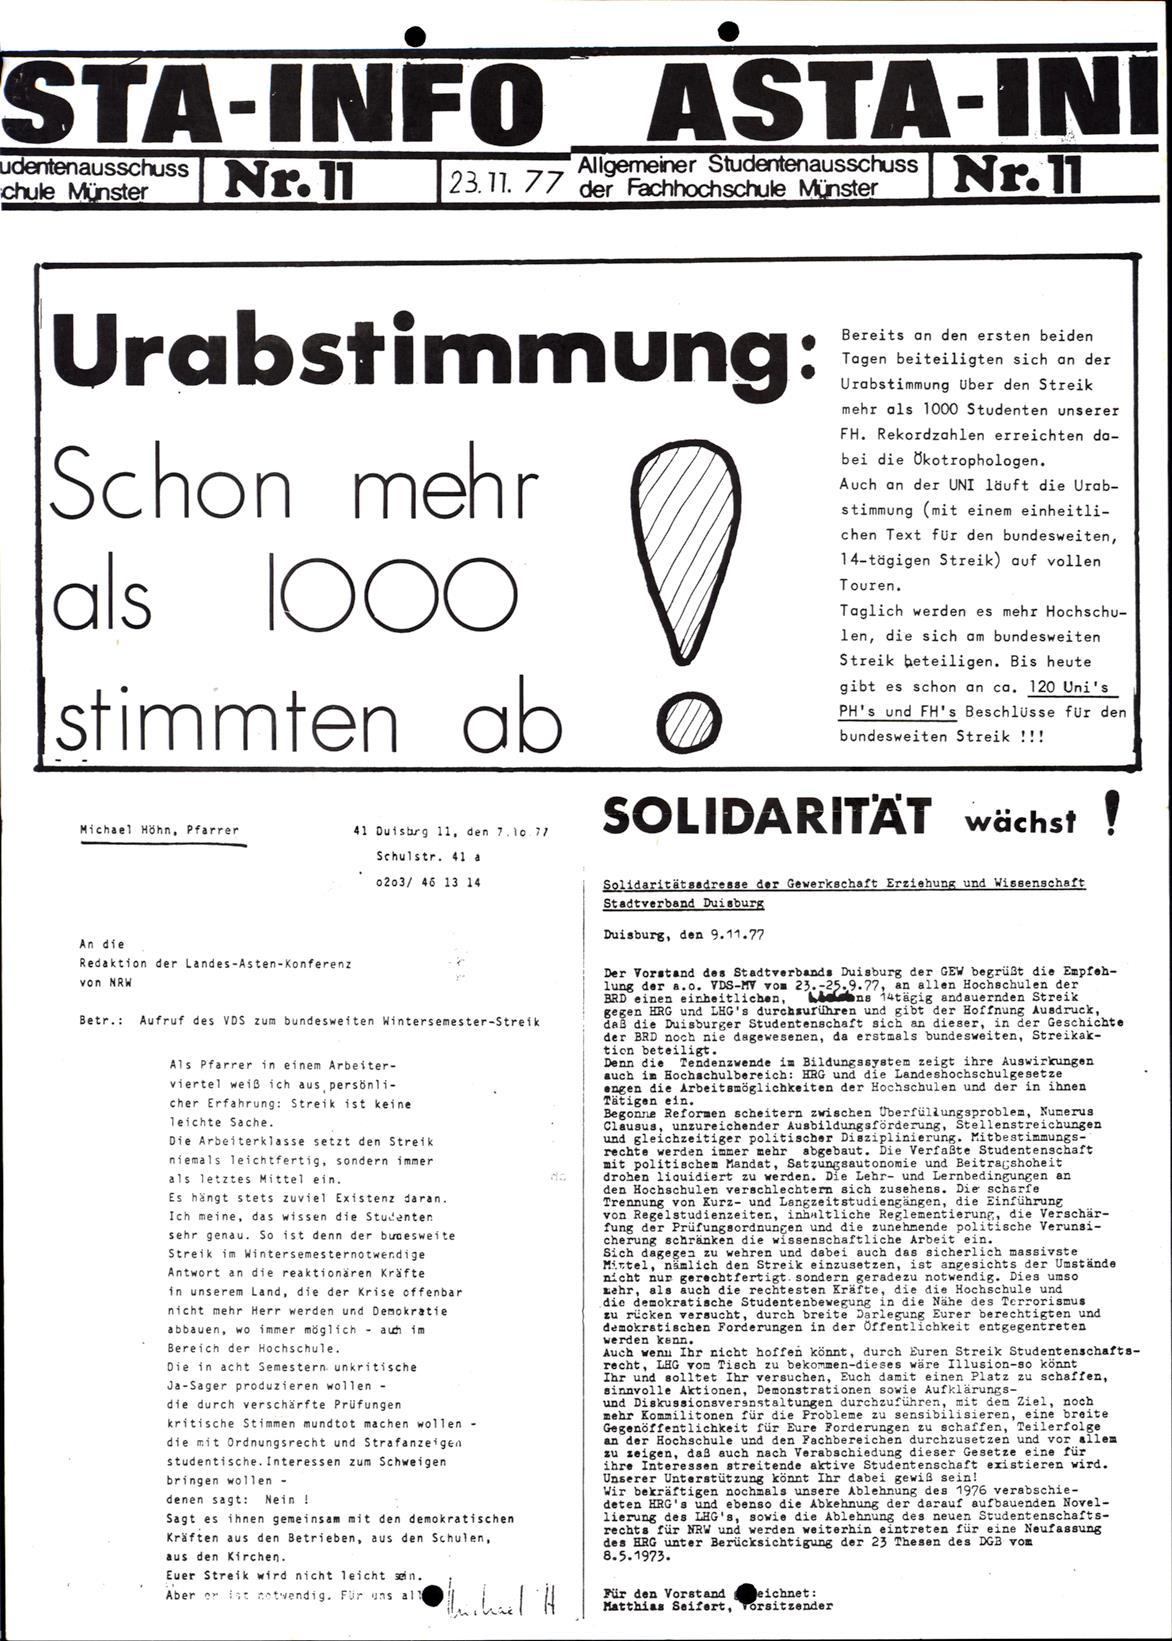 Muenster_19771121_FH_AStA_Info_11_01